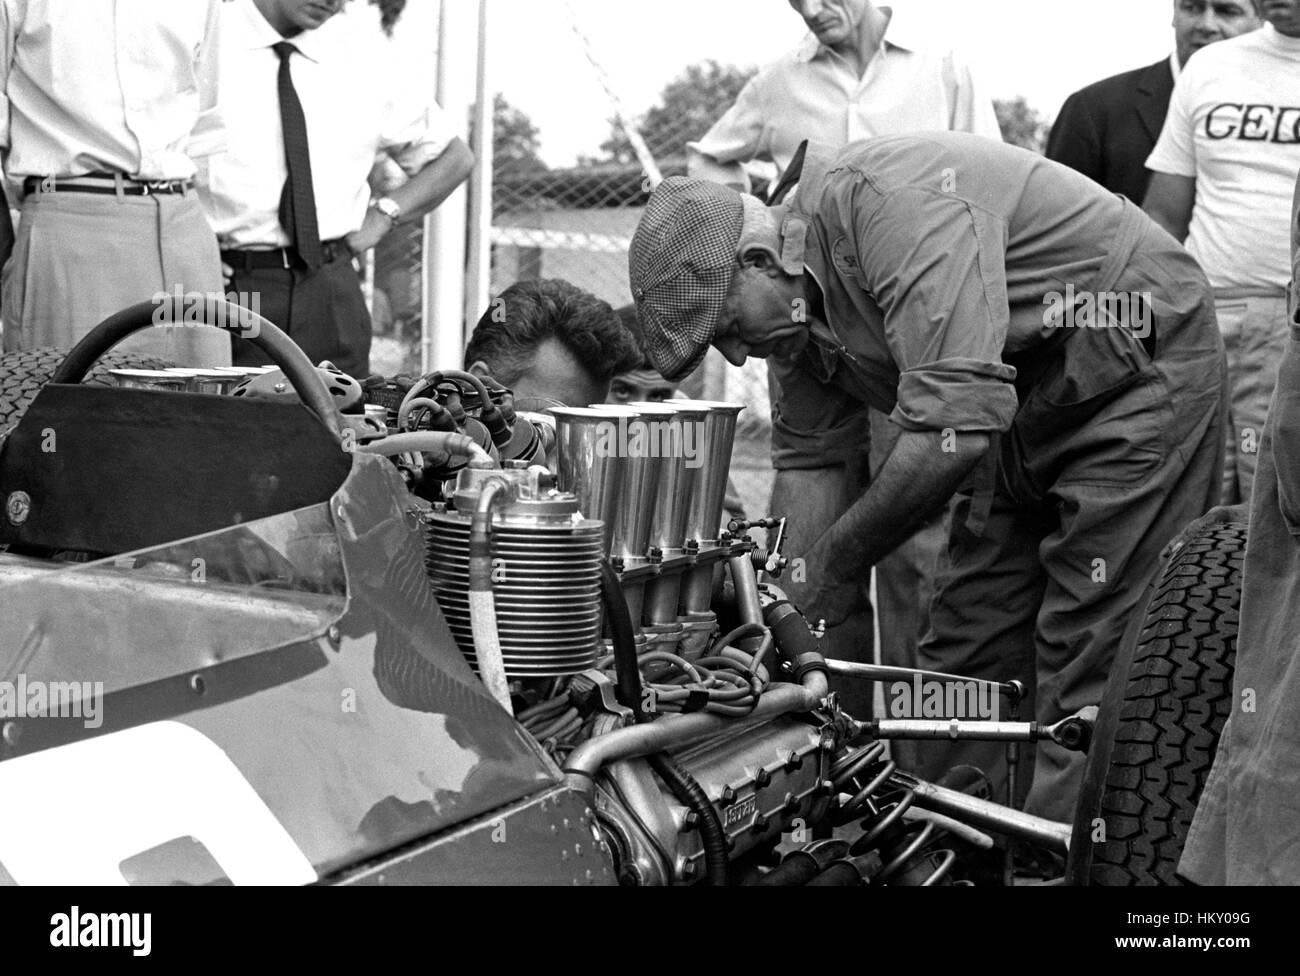 1964 Ferrari 158 Motor Monza Paddock GG - Stock Image